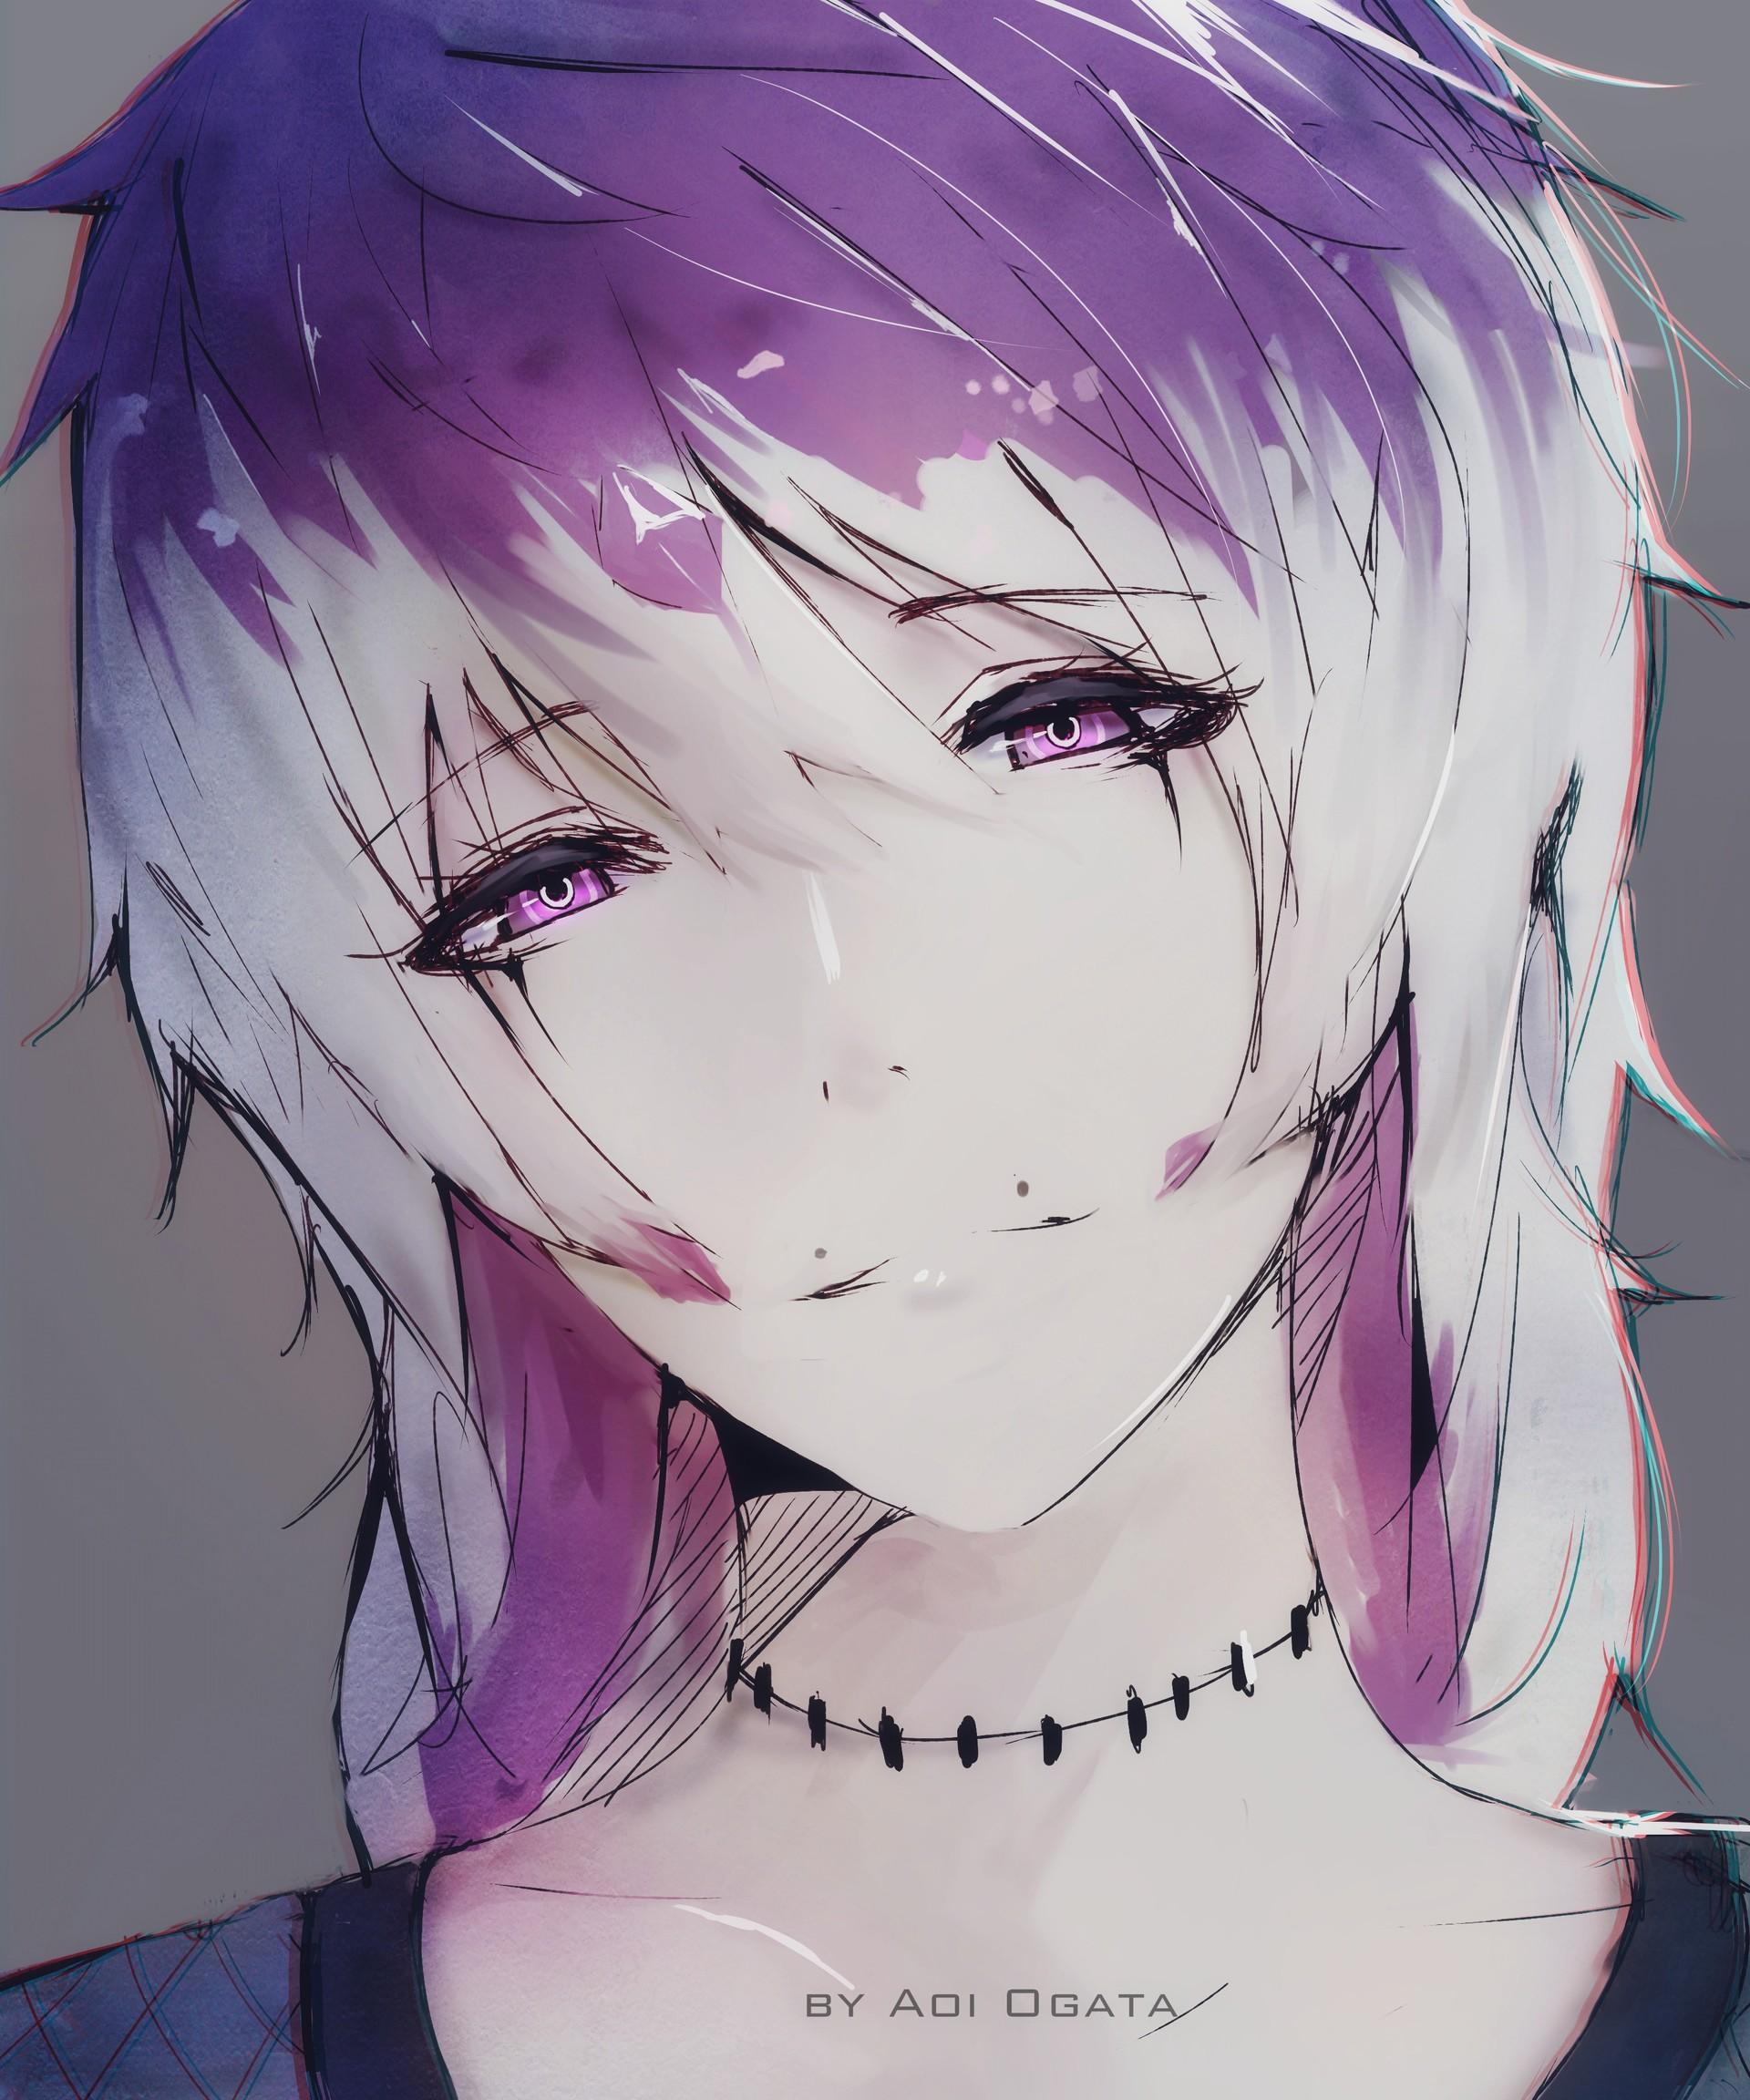 Aoi ogata aki22